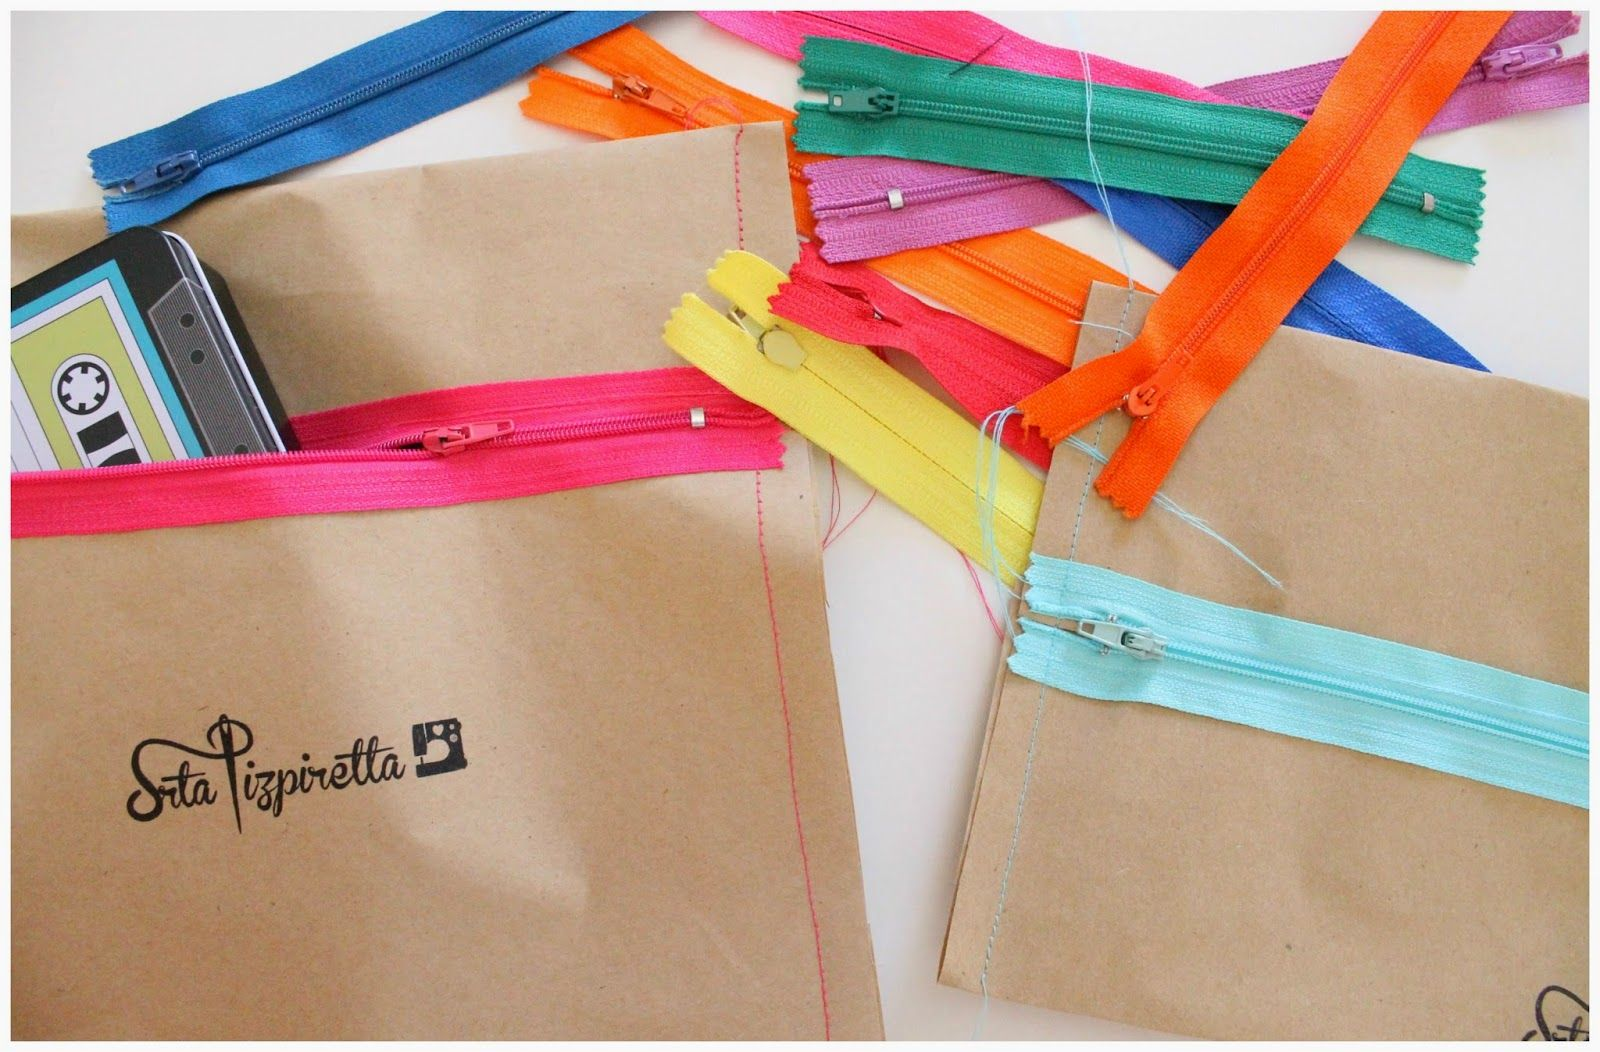 Srta.Pizpiretta: DIY: (Sew) Packaging Cosido